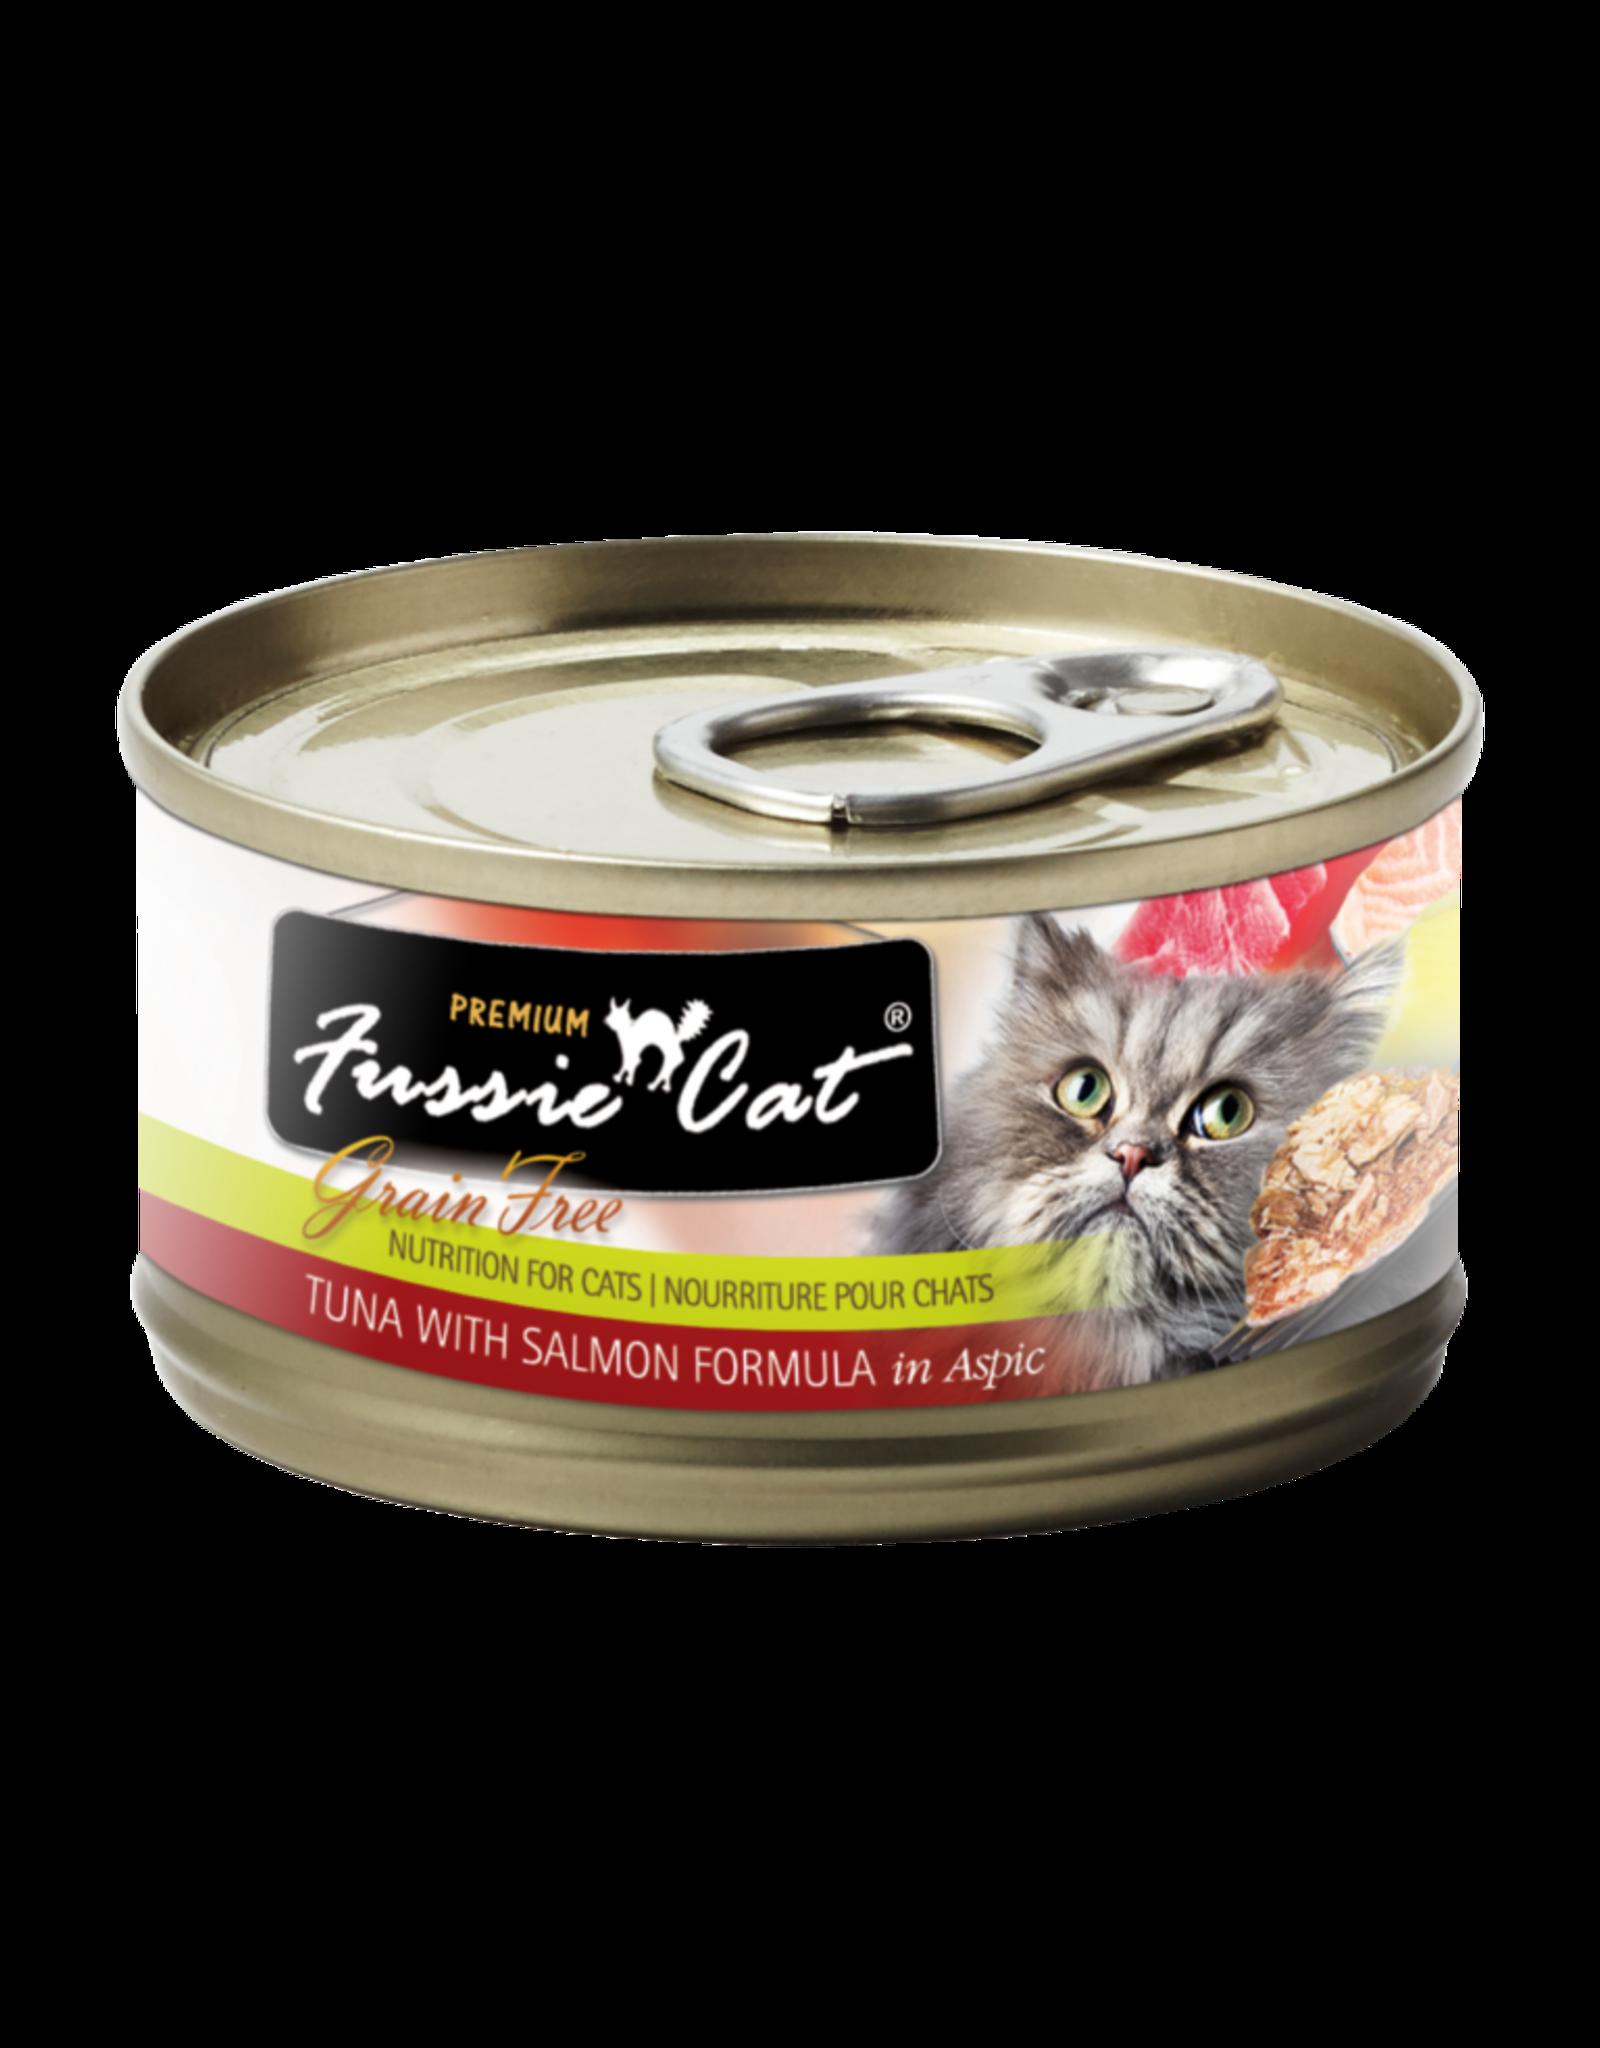 Fussie Cat FUSSIE CAT PREMIUM TUNA WITH SALMON FORMULA IN ASPIC 2.8OZ